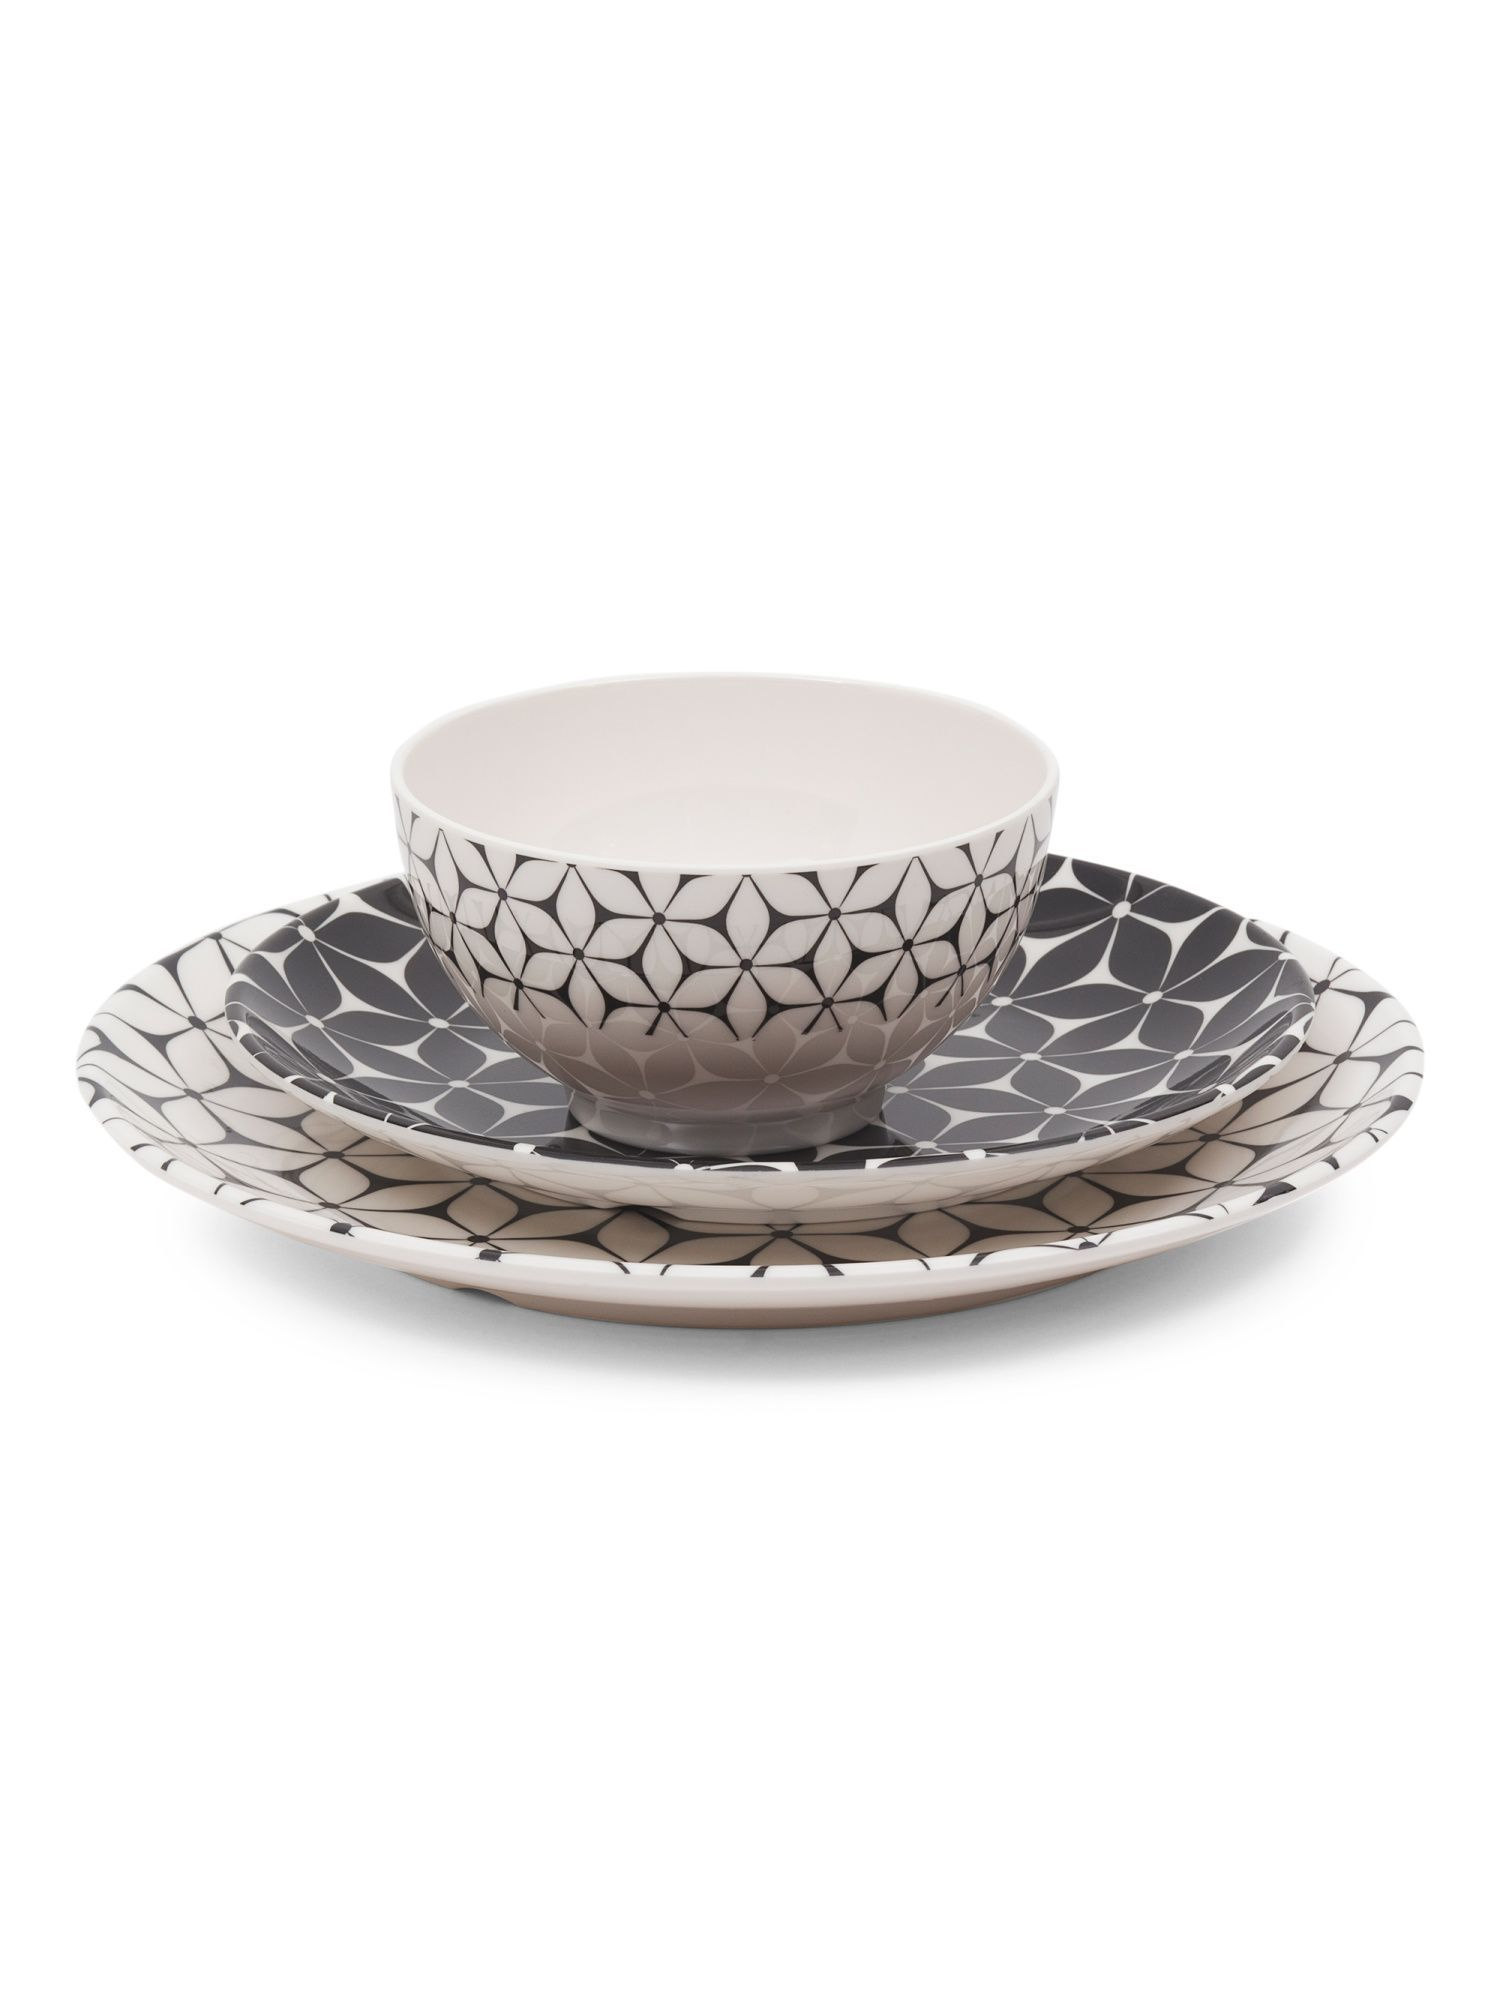 12pc Strata Outdoor Dinnerware Set | Products | Pinterest ...